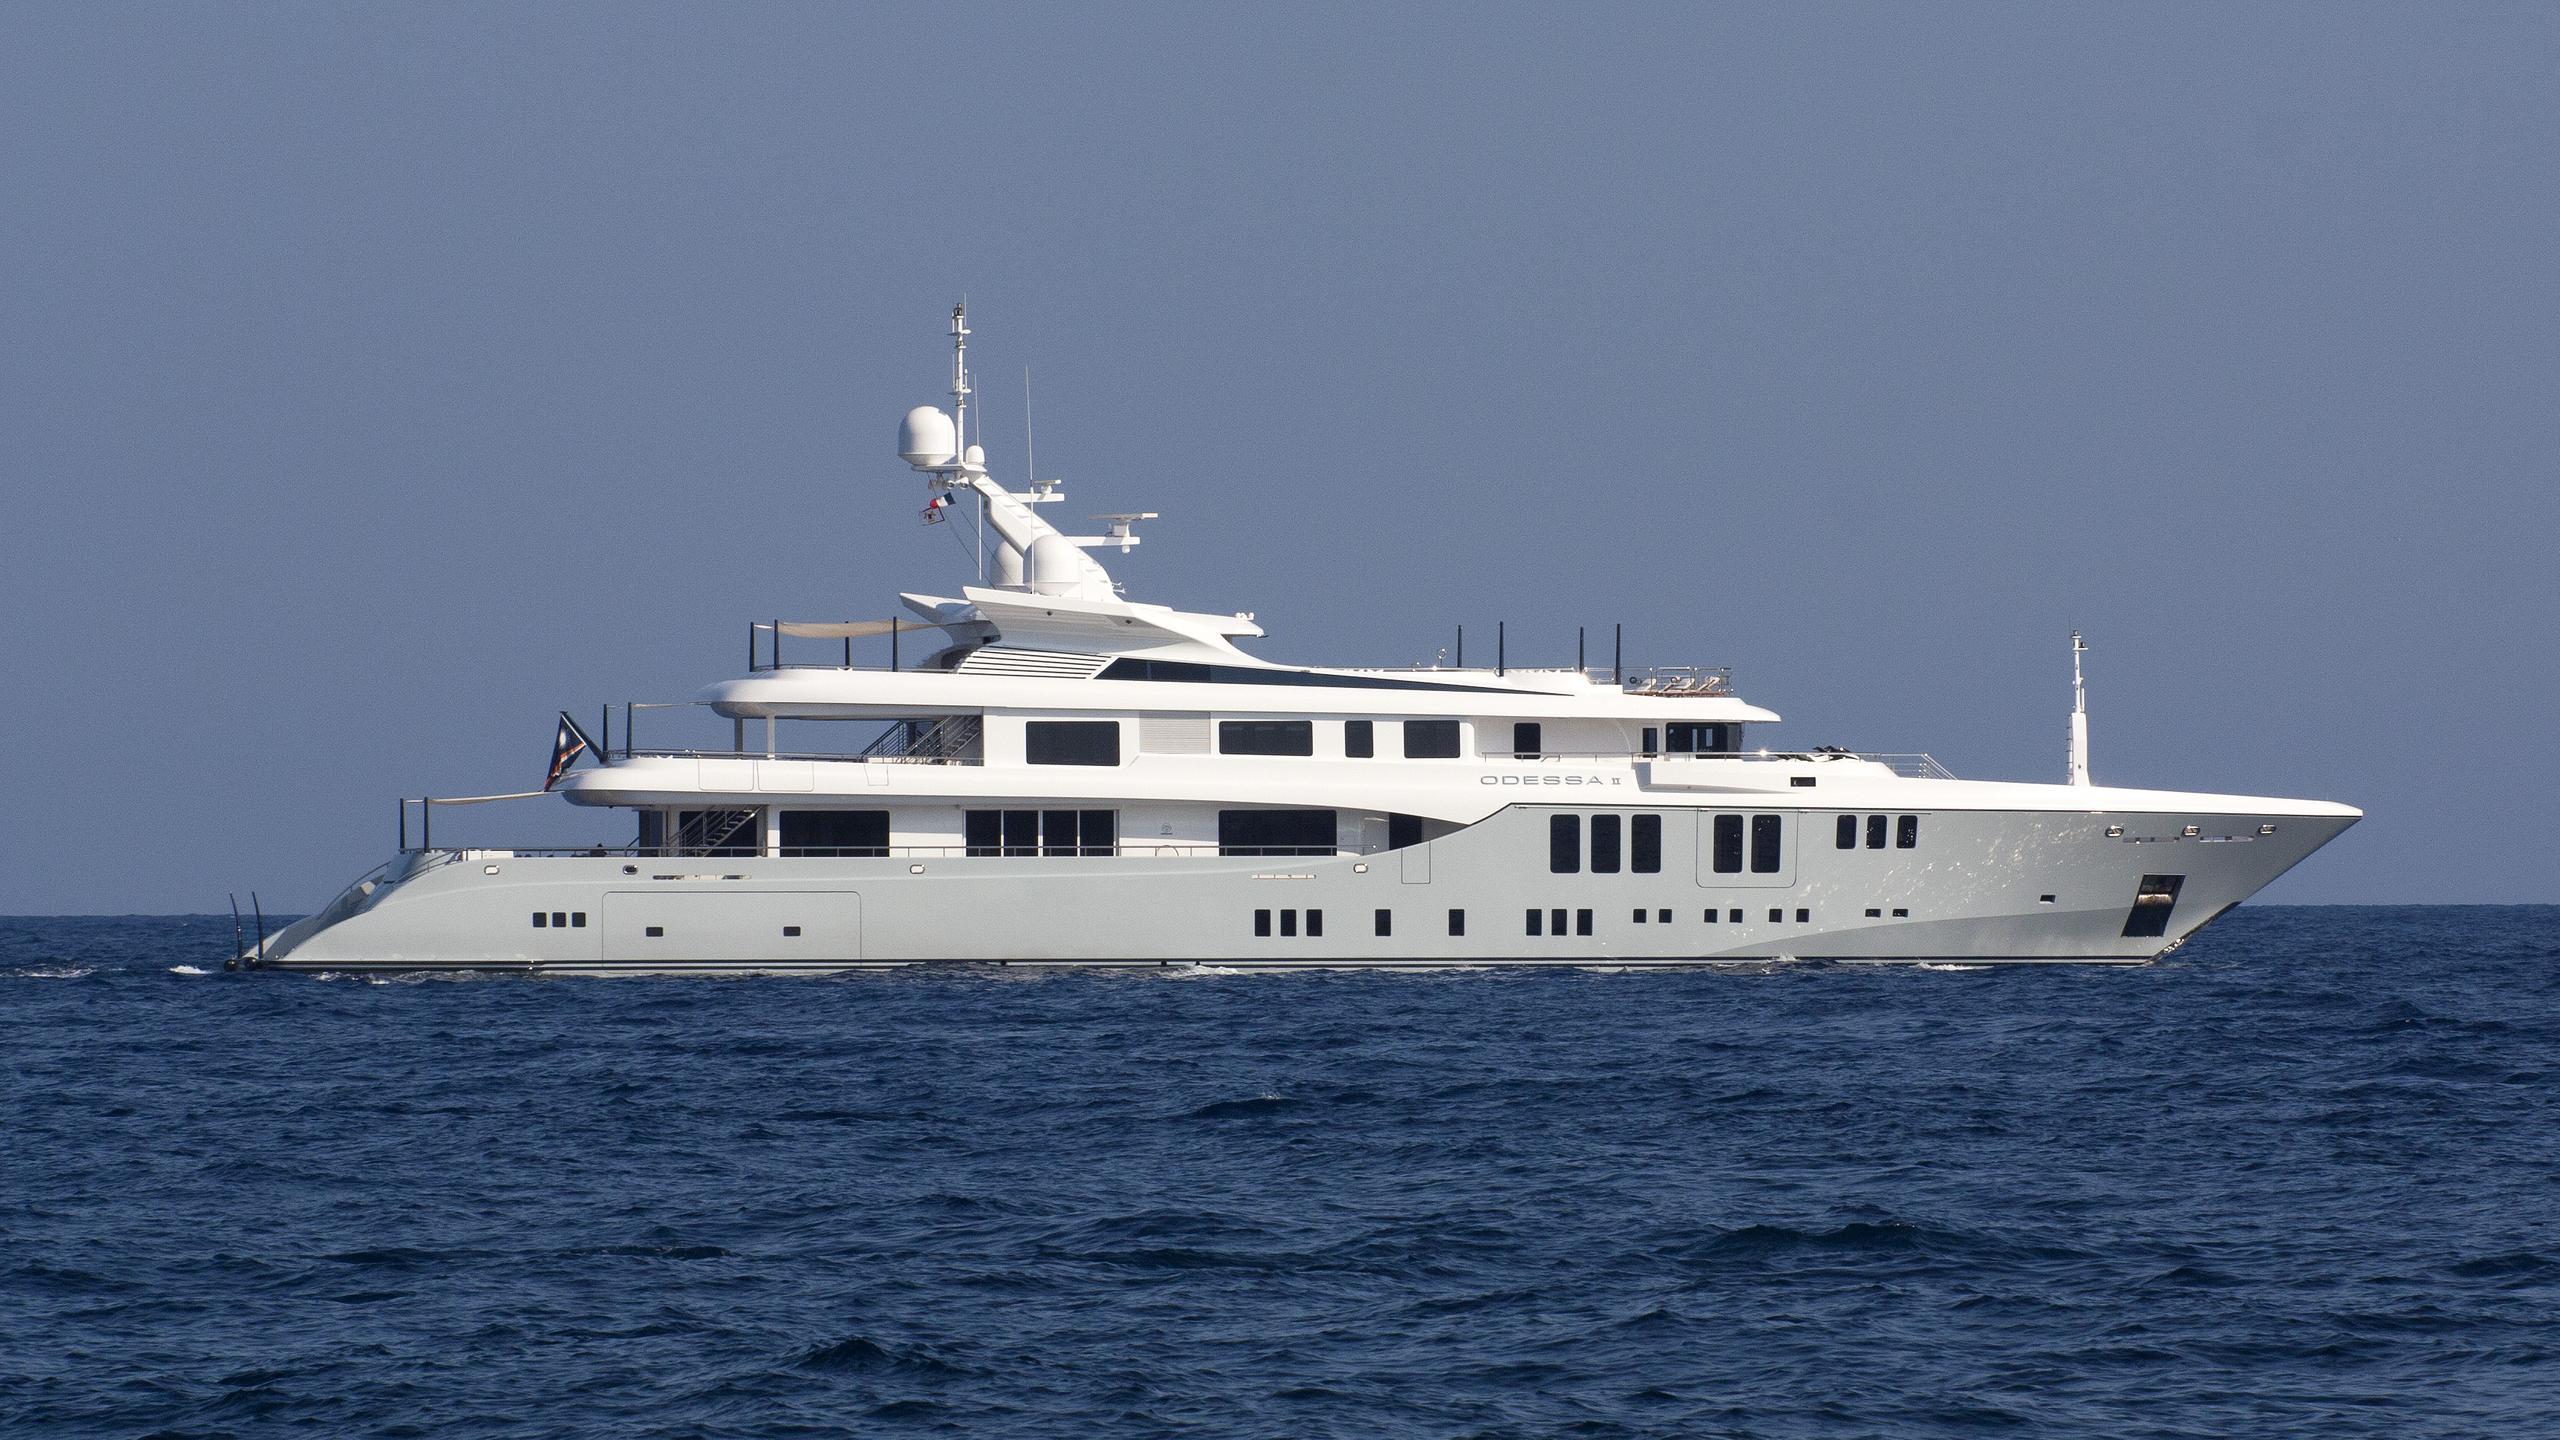 odessa-ii-motor-yacht-nobiskrug-2013-73m-profile